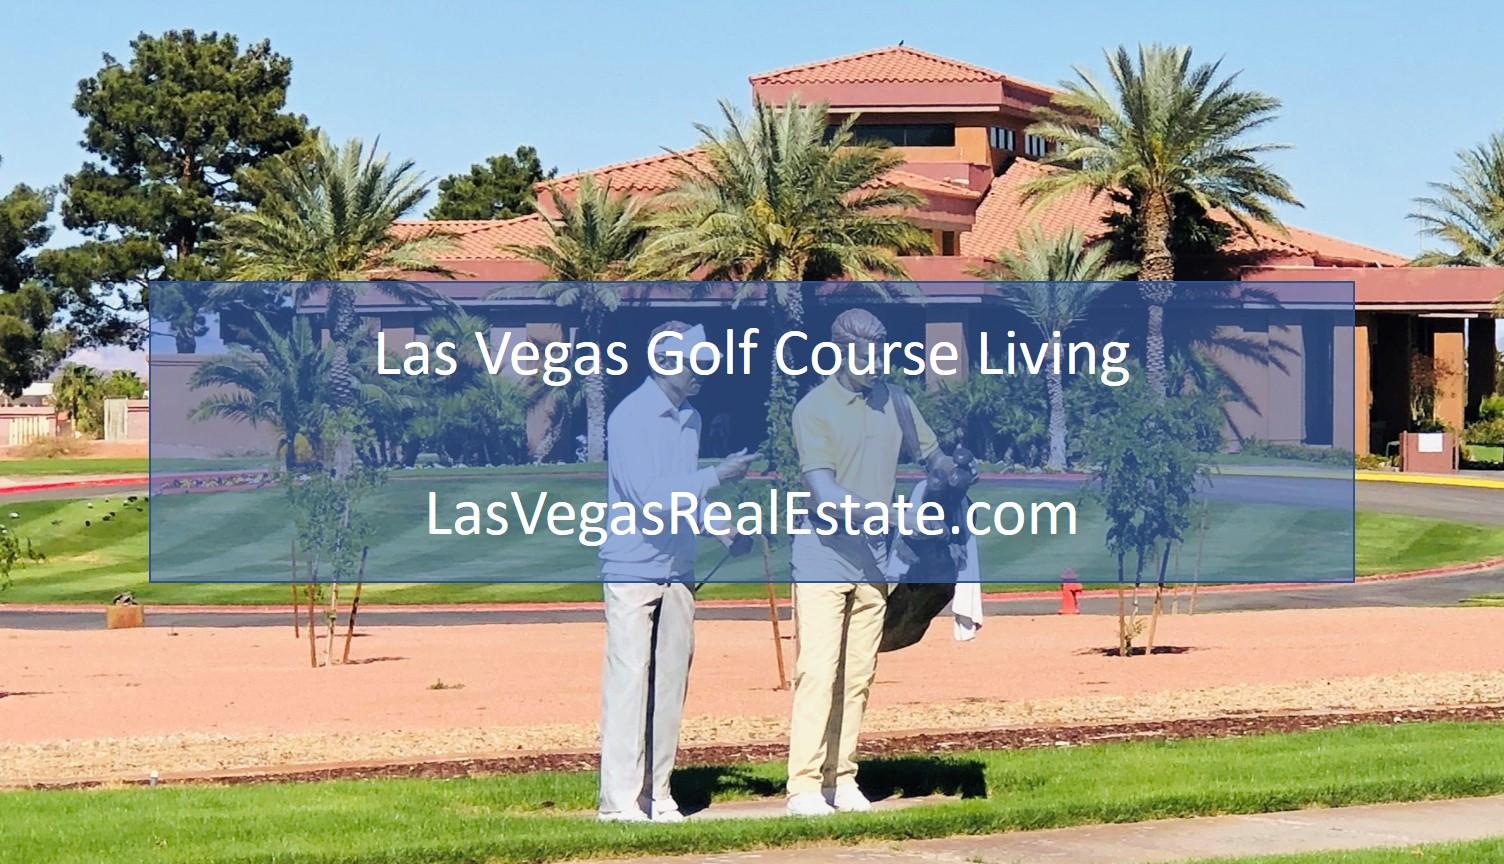 Las Vegas Golf Course Living - LasVegasRealEstate.com